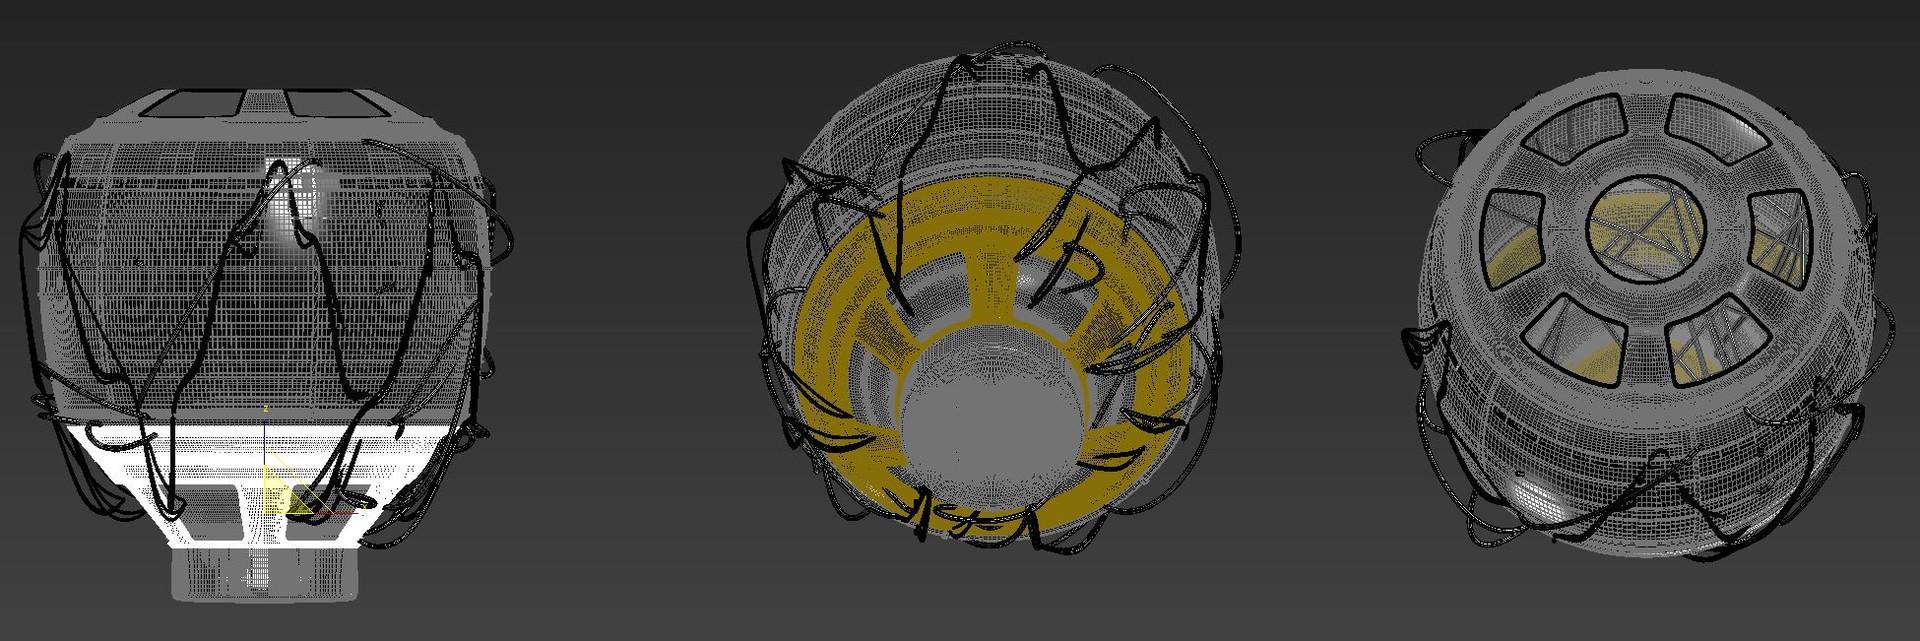 Kresimir jelusic robob3ar capture